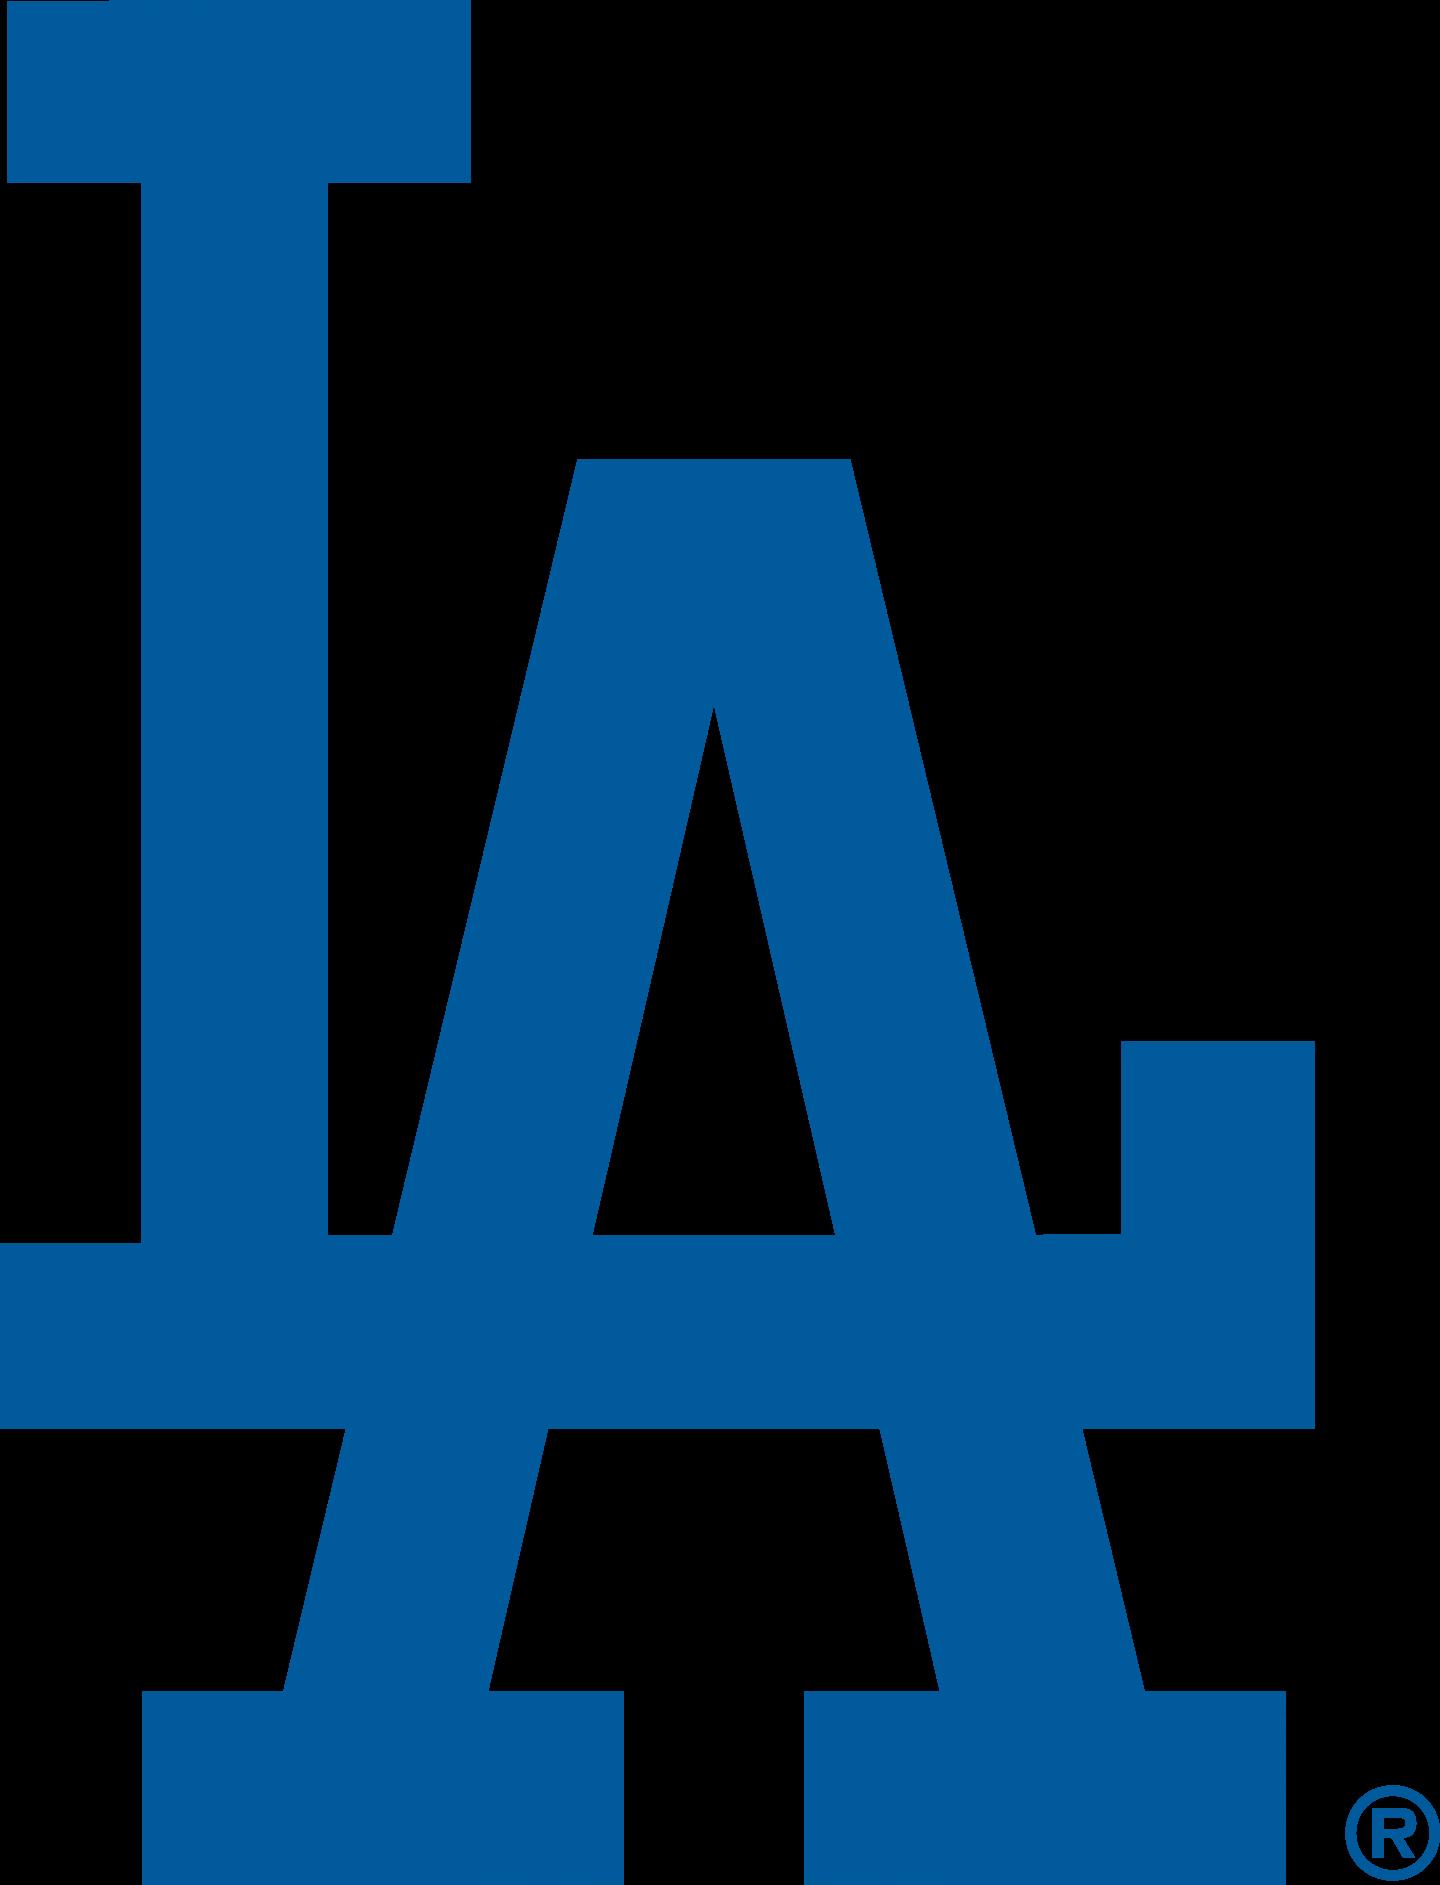 los angeles dodgers logo 2 - Los Angeles Dodgers Logo